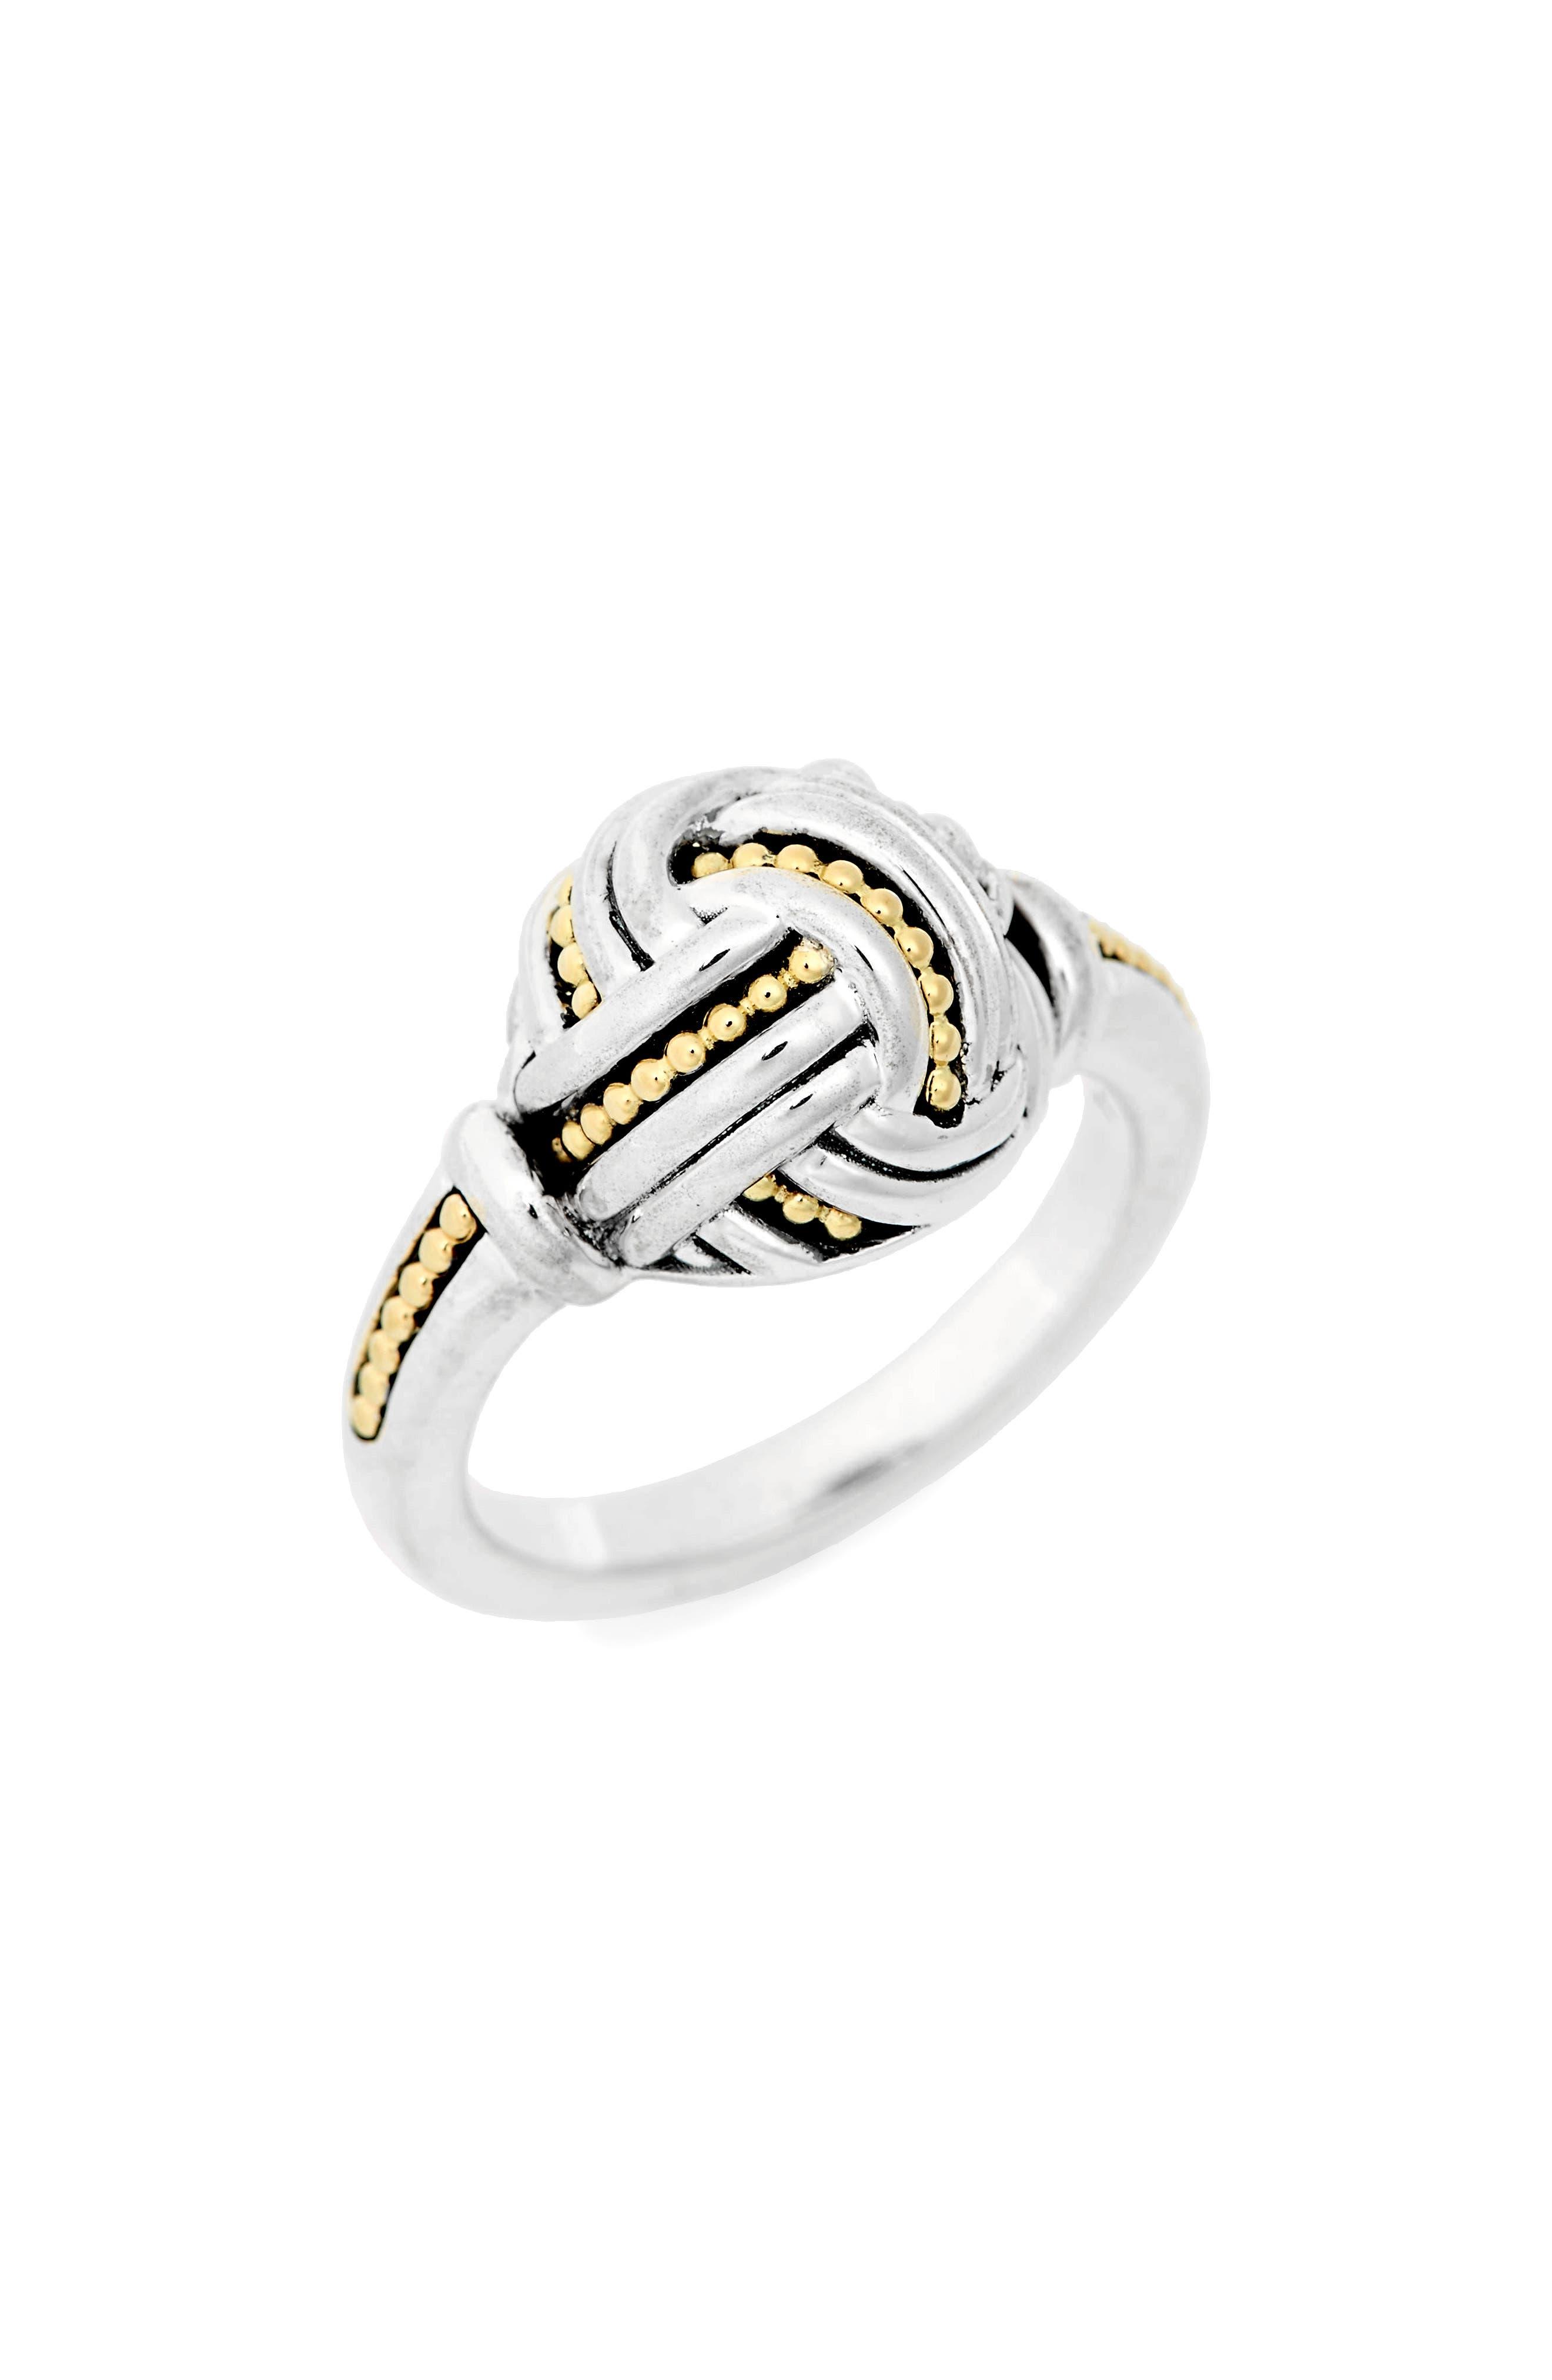 Small Round Ring,                             Main thumbnail 1, color,                             SILVER/ GOLD